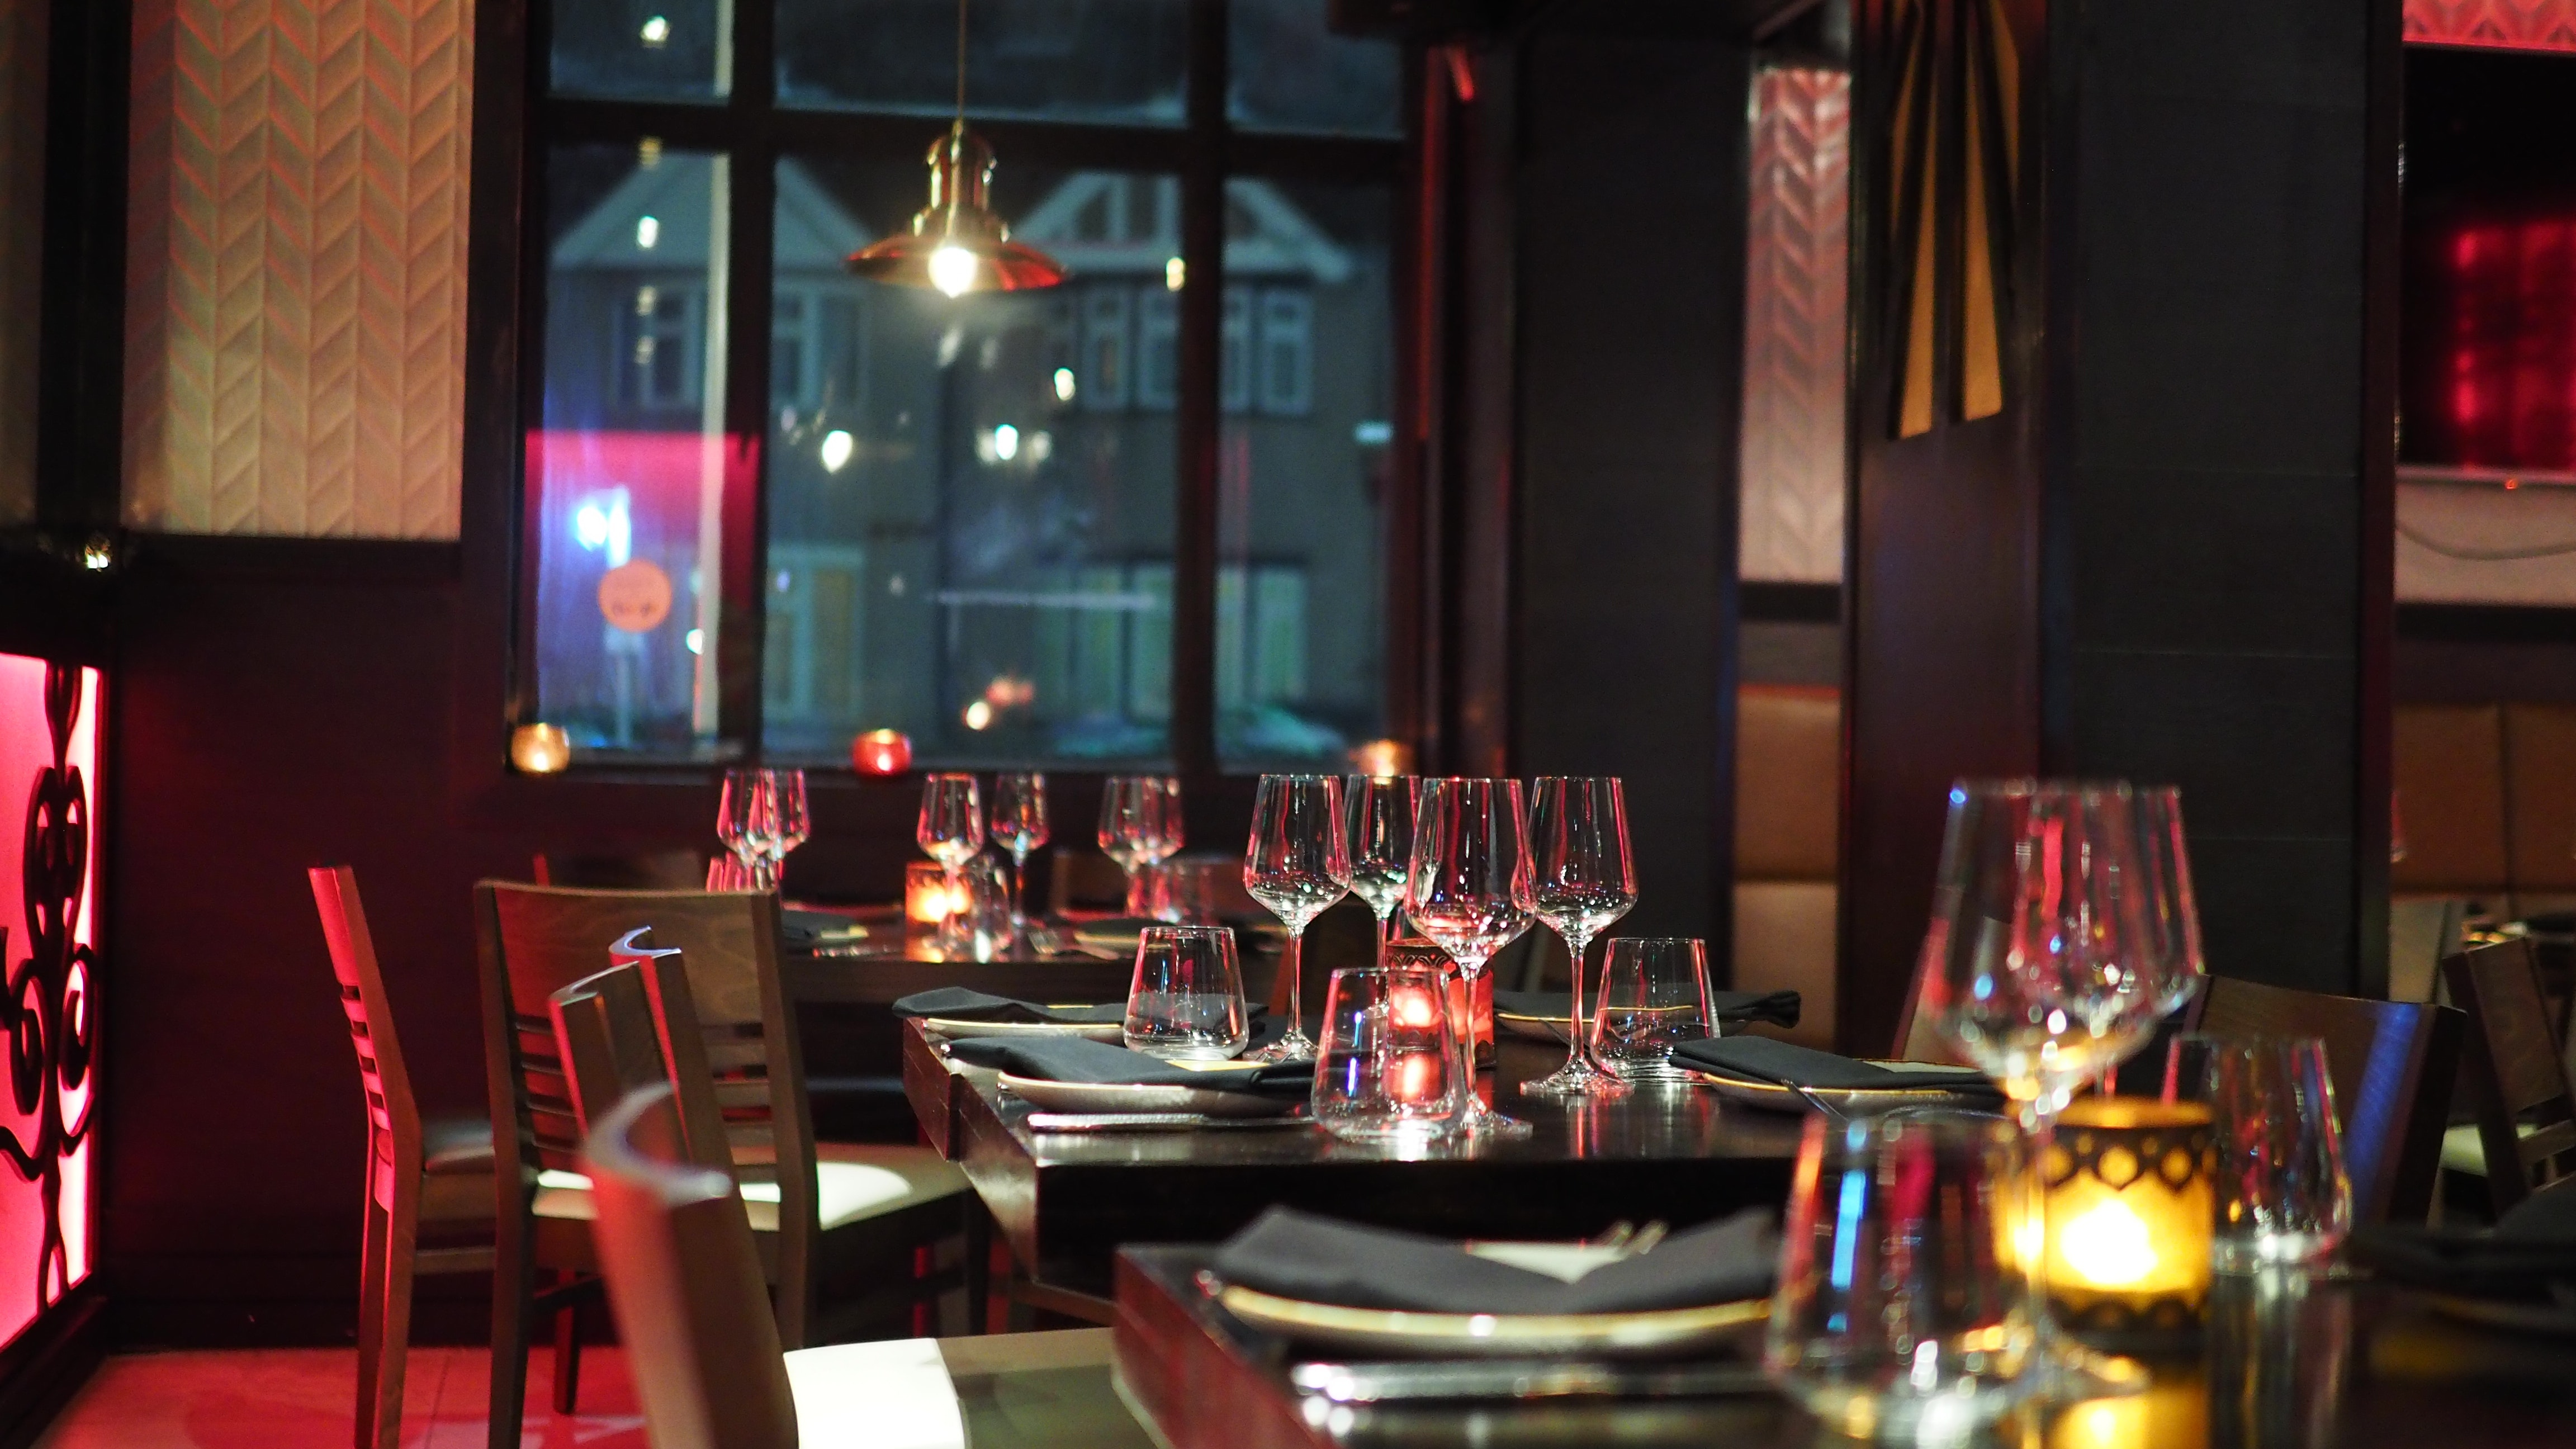 Restaurant Images Amp Restaurant Stock Photos 183 Pexels